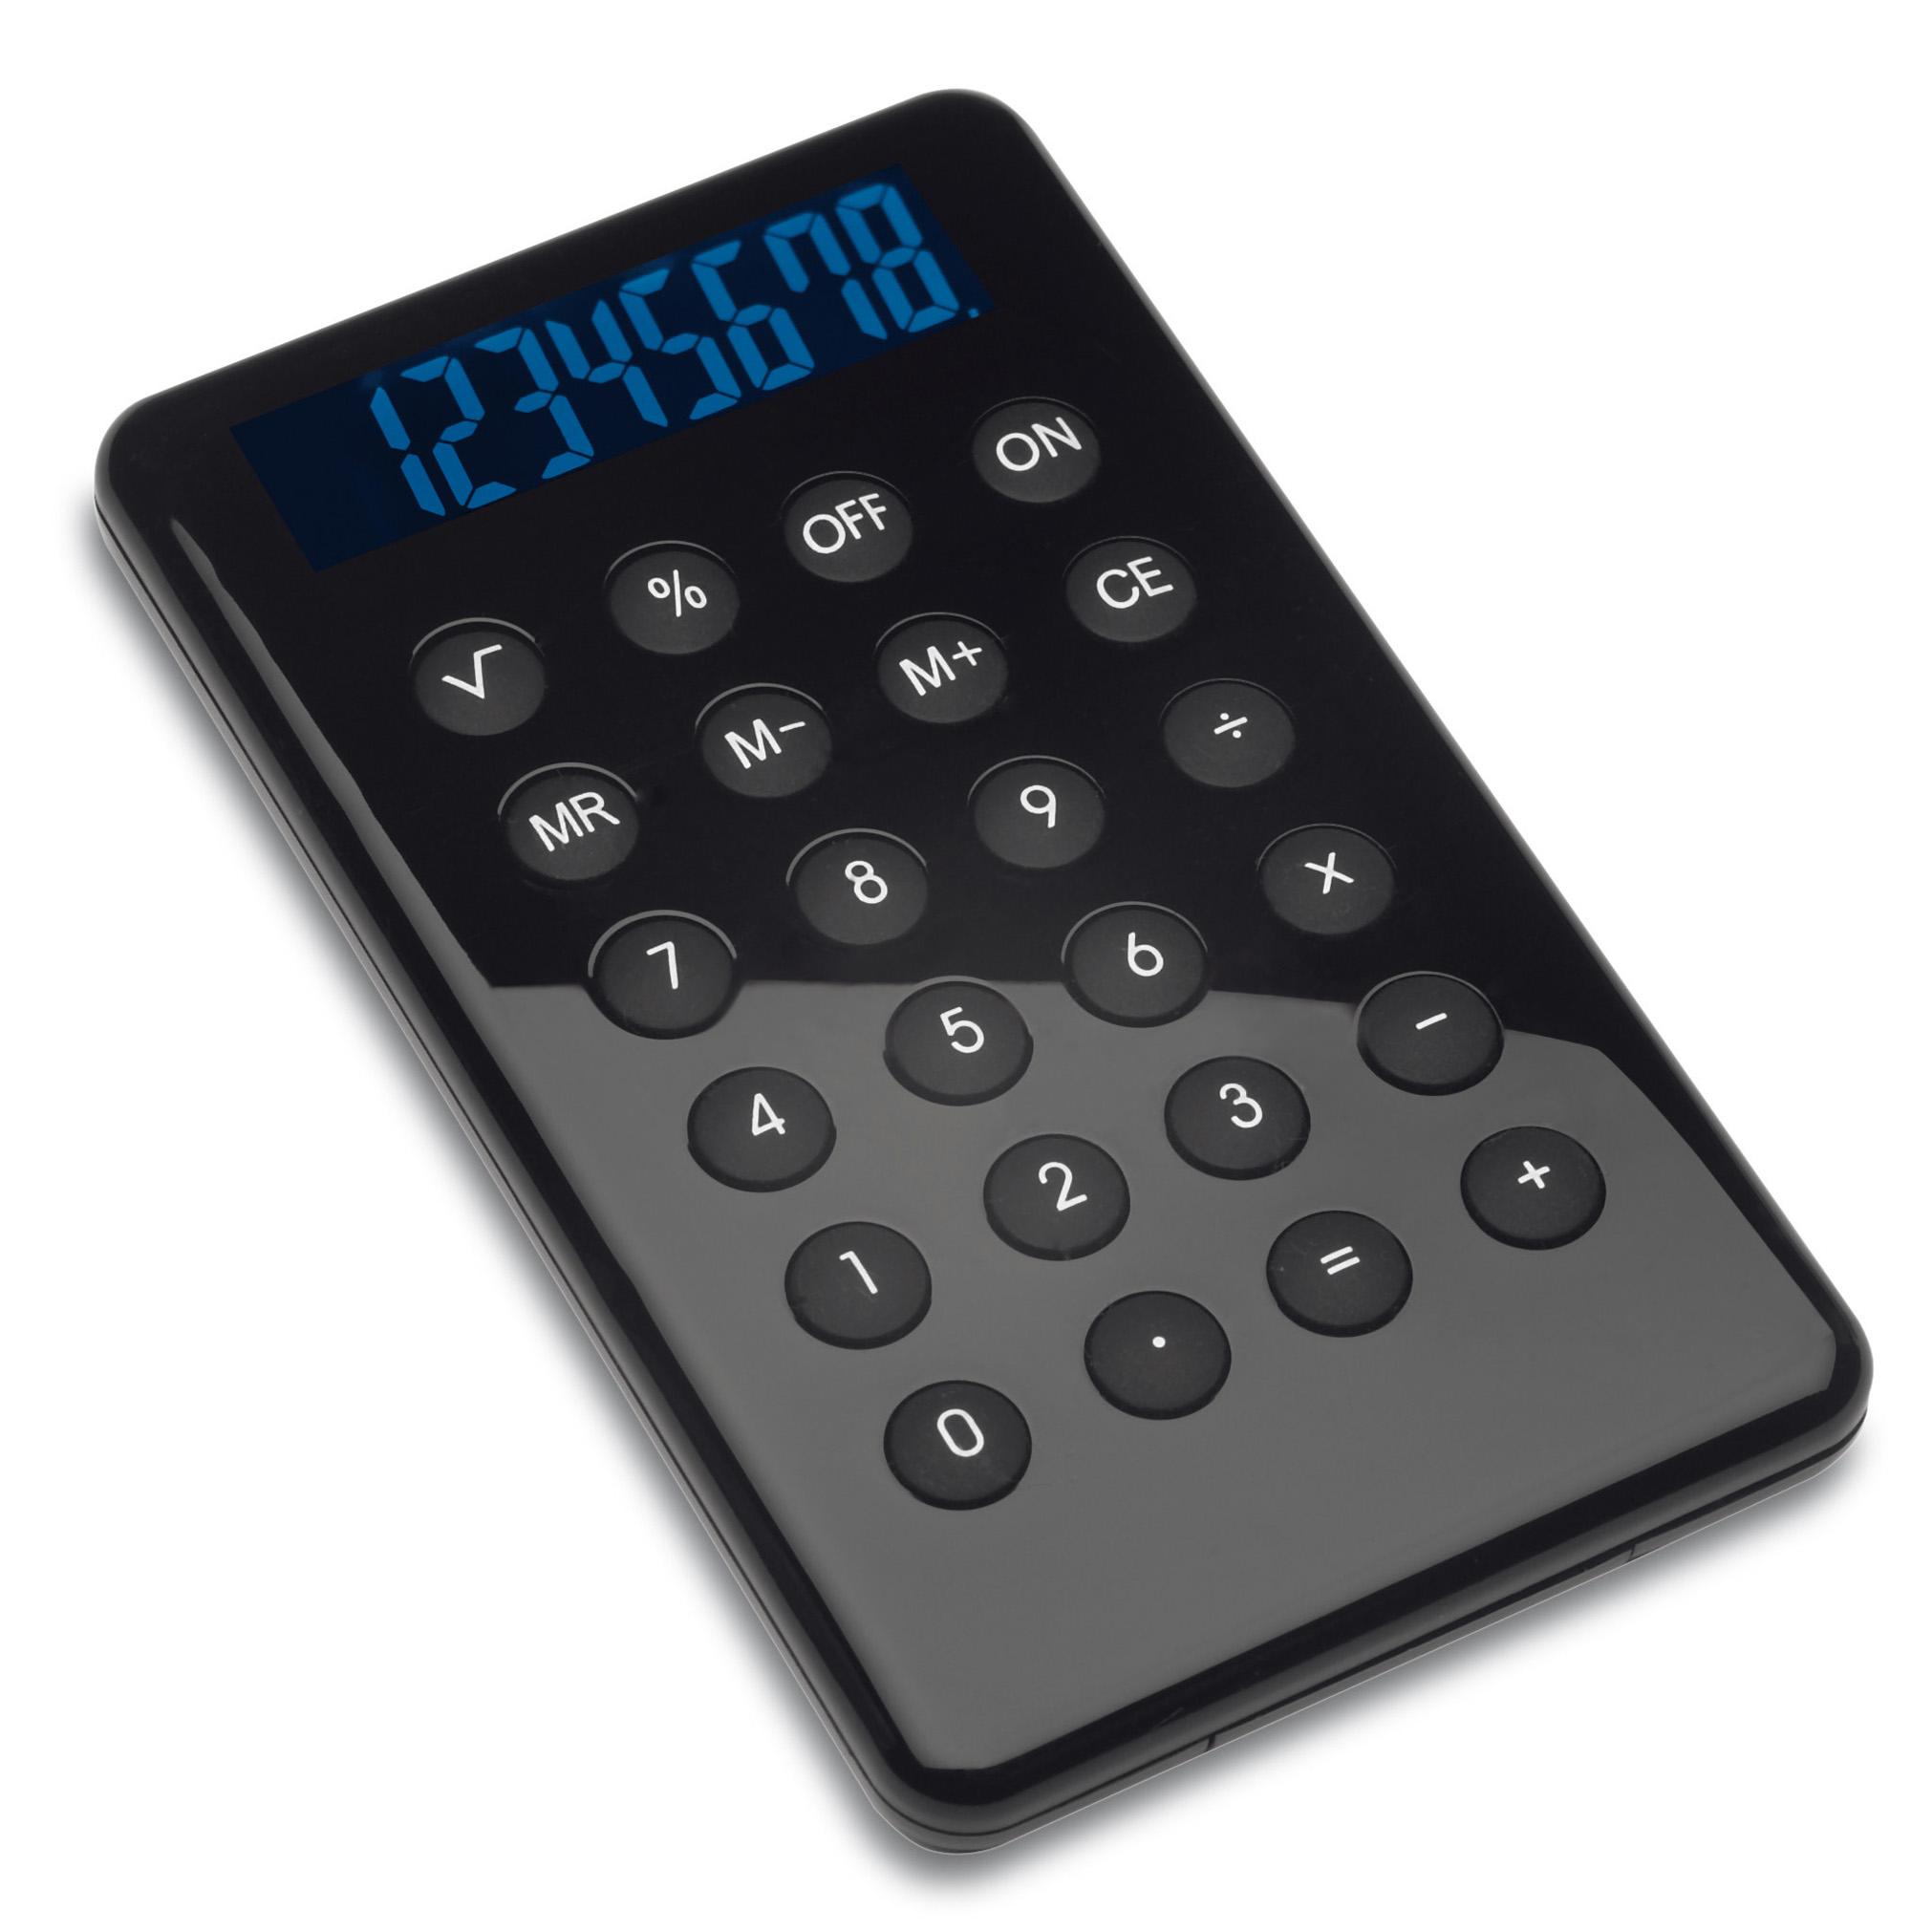 Taschenrechner REFLECTS A ...